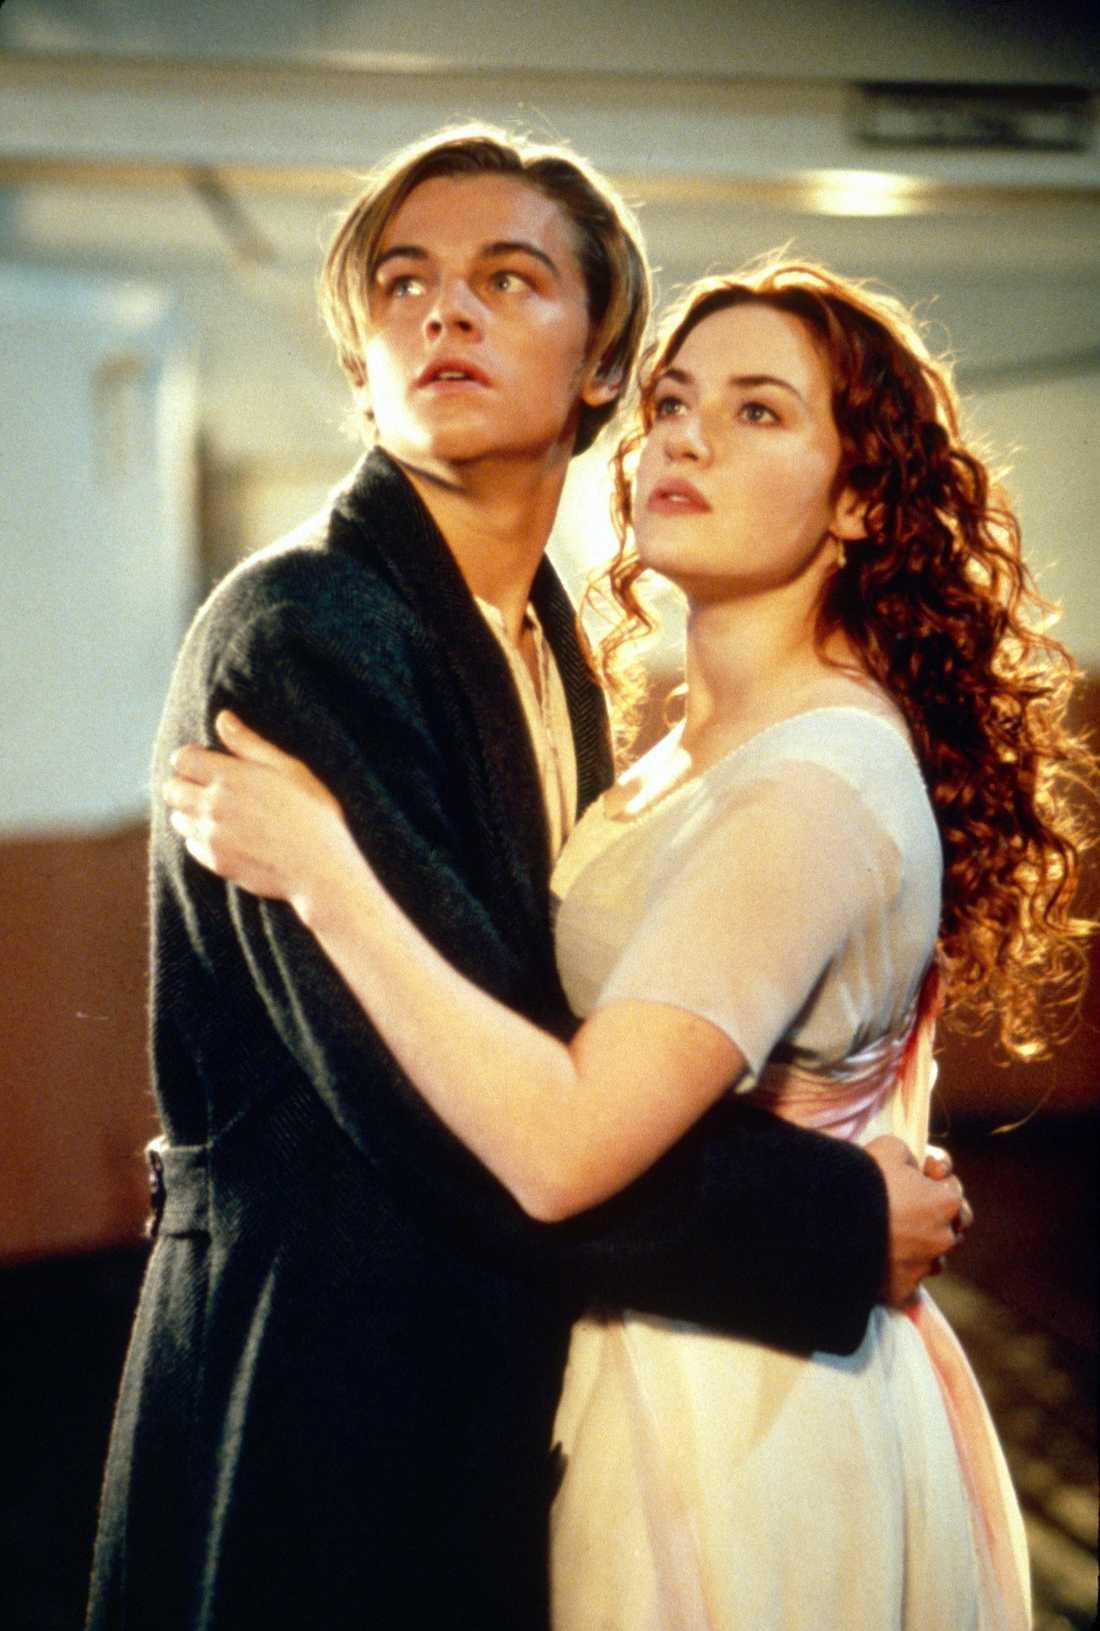 En klassisk bild ur filmen.